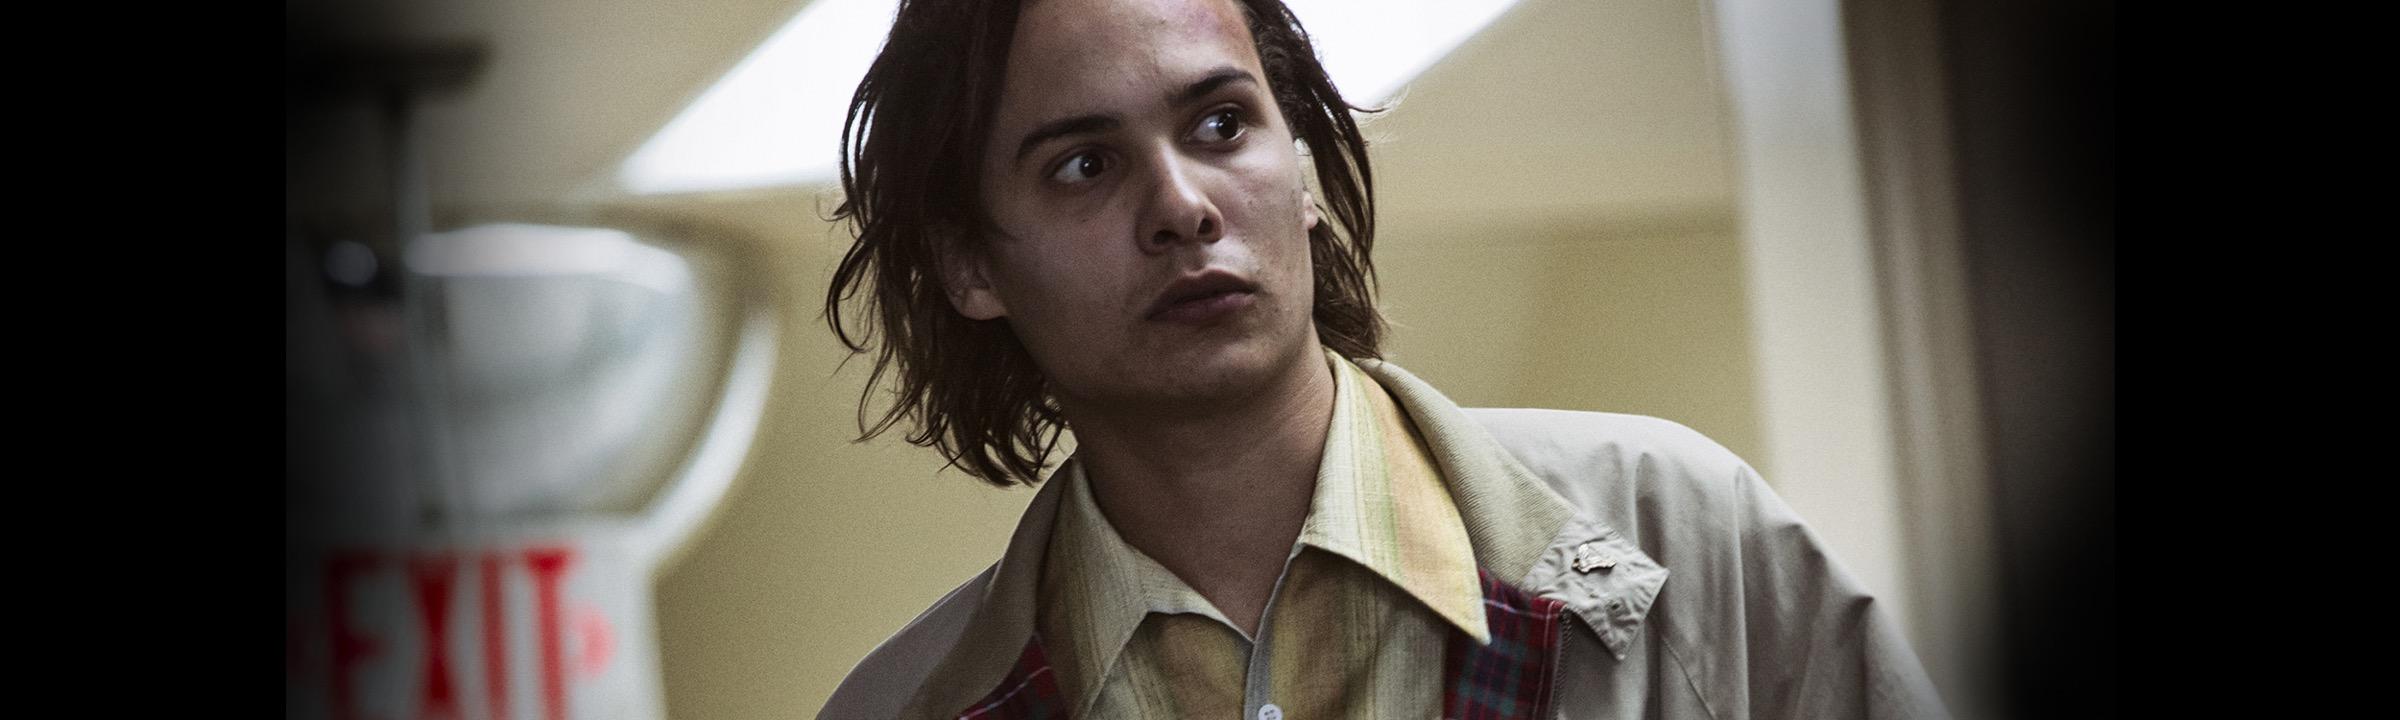 fear-the-walking-dead-entrevista-frank-dillane-nick-001